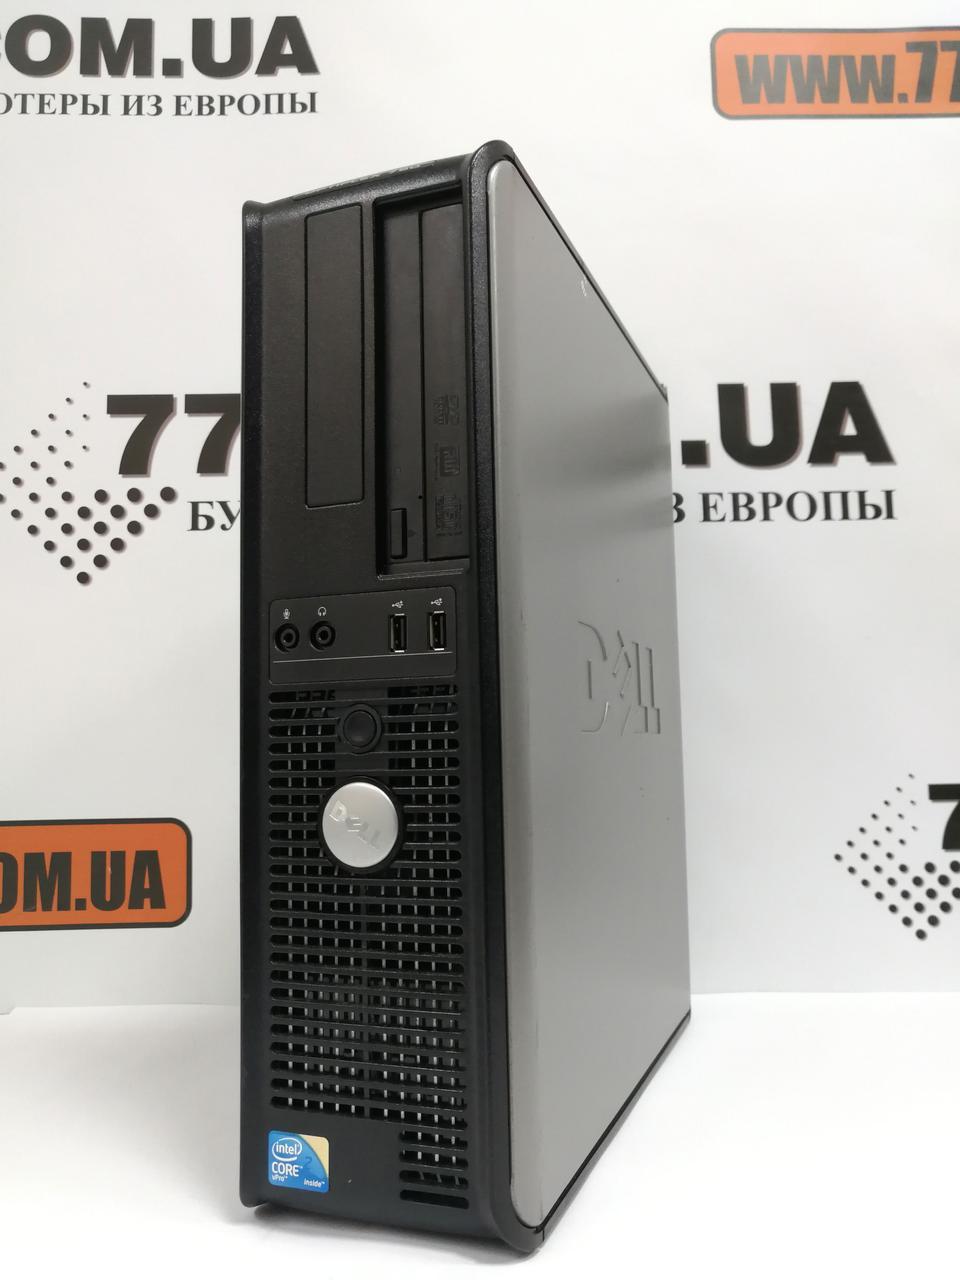 Компьютер Dell OptiPlex 780 (Desktop), Intel Core2Duo E7500 2.93GHz, RAM 4ГБ (DDR3), HDD 160ГБ